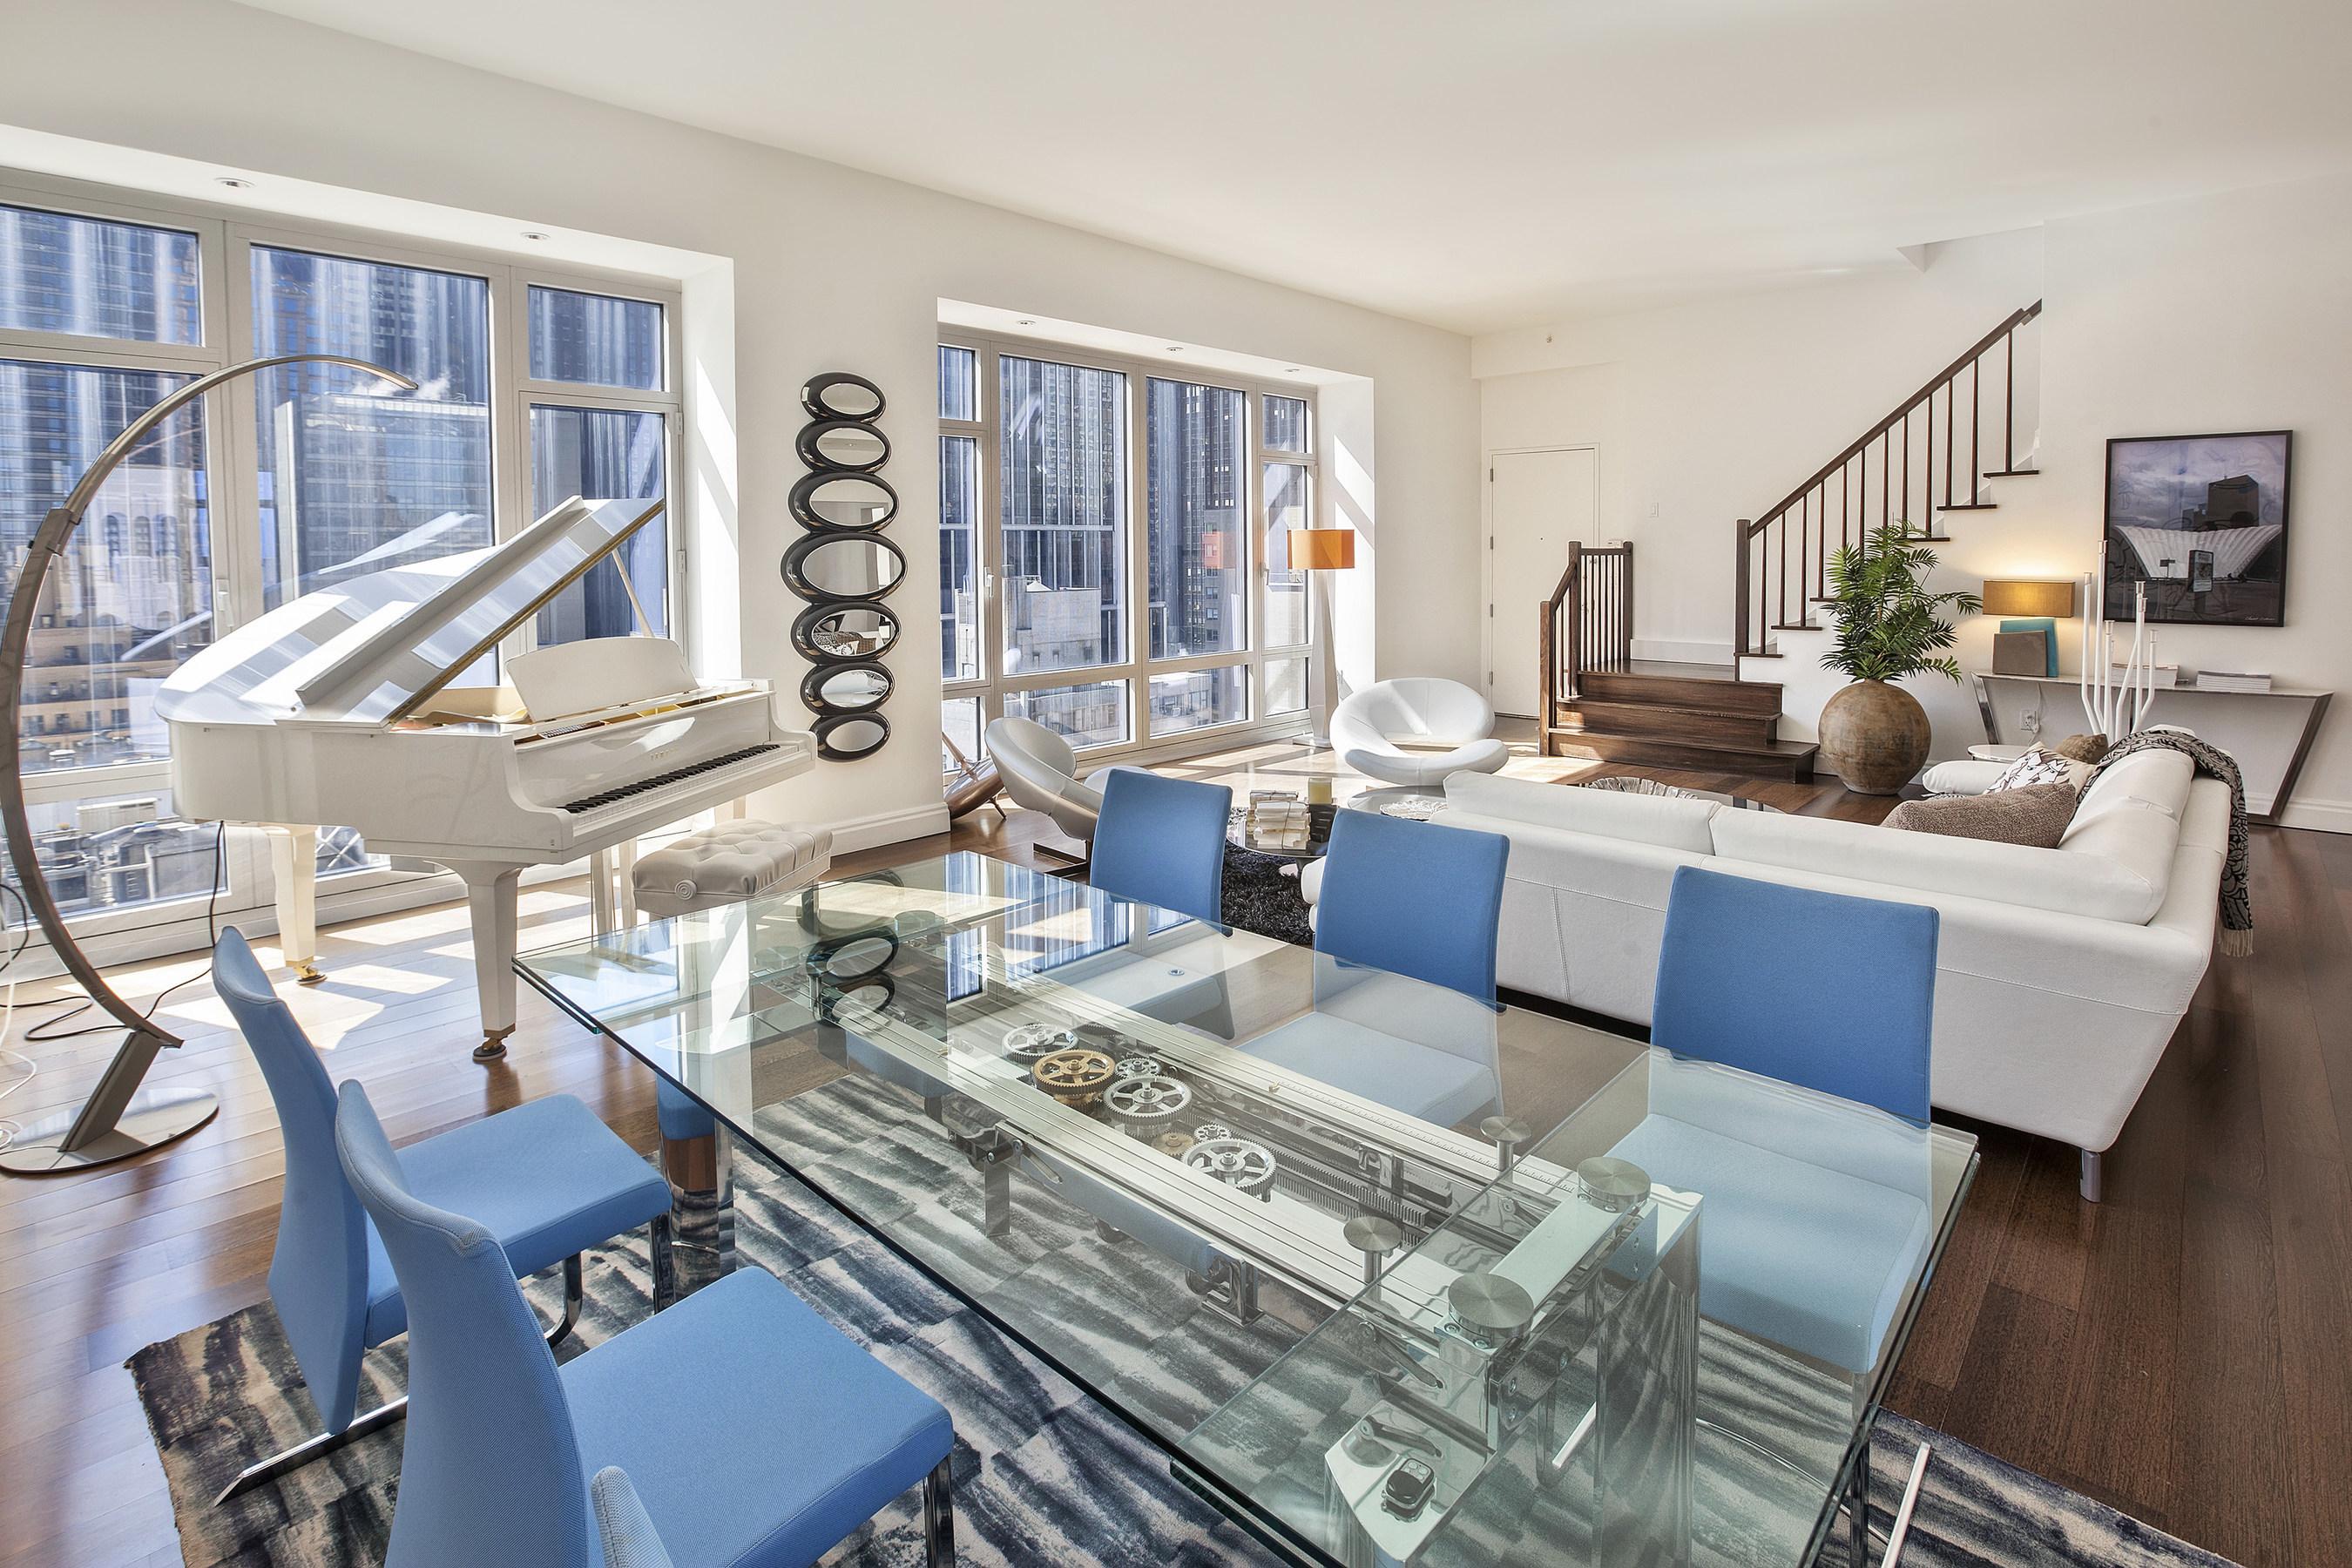 NEW YORK - Penthouse at I.M Pei's Centurion Condo at 33 West 56th Street, New York (Scott Wintrow/Gamut Photos)